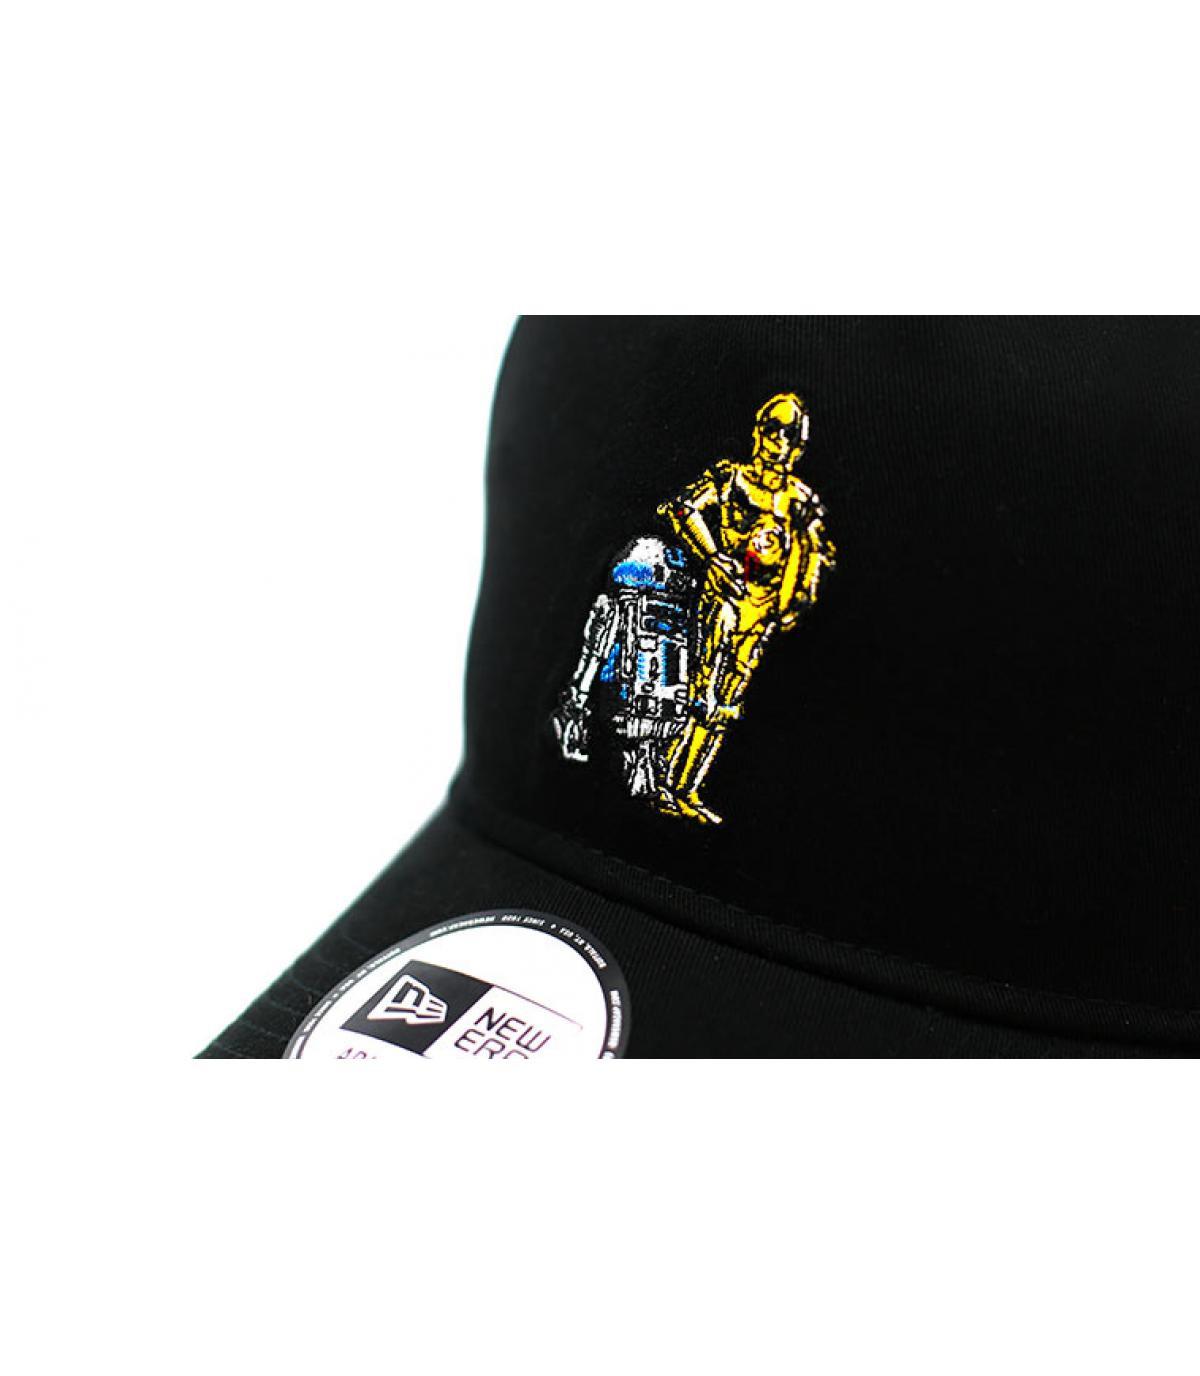 Details Cap Star Wars Droids 940 A Frame black - Abbildung 3